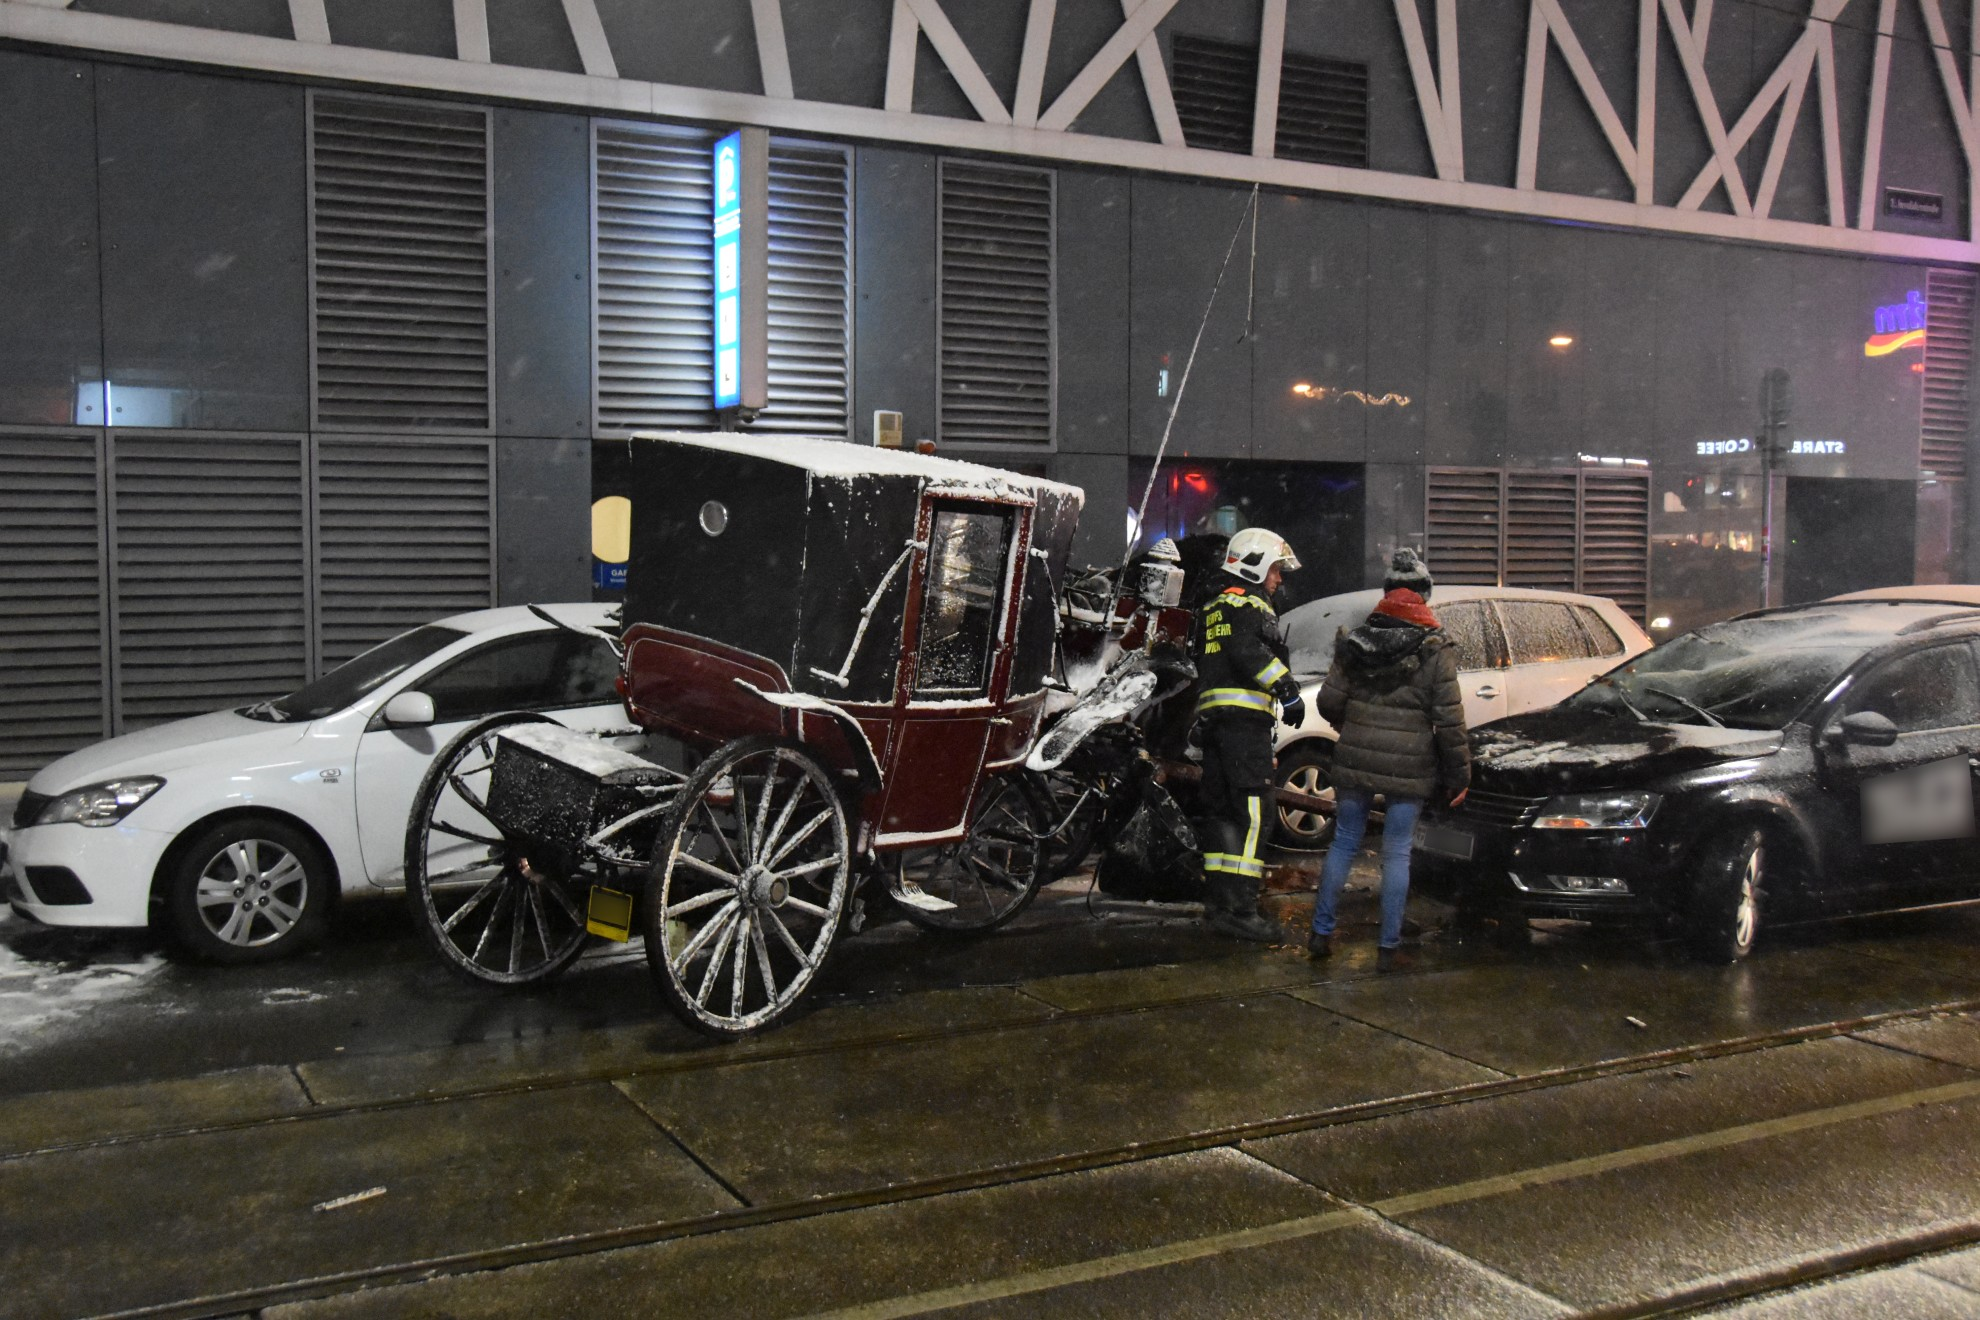 Kutscher und Pferd bei Verkehrsunfall verletzt – ÖBFV